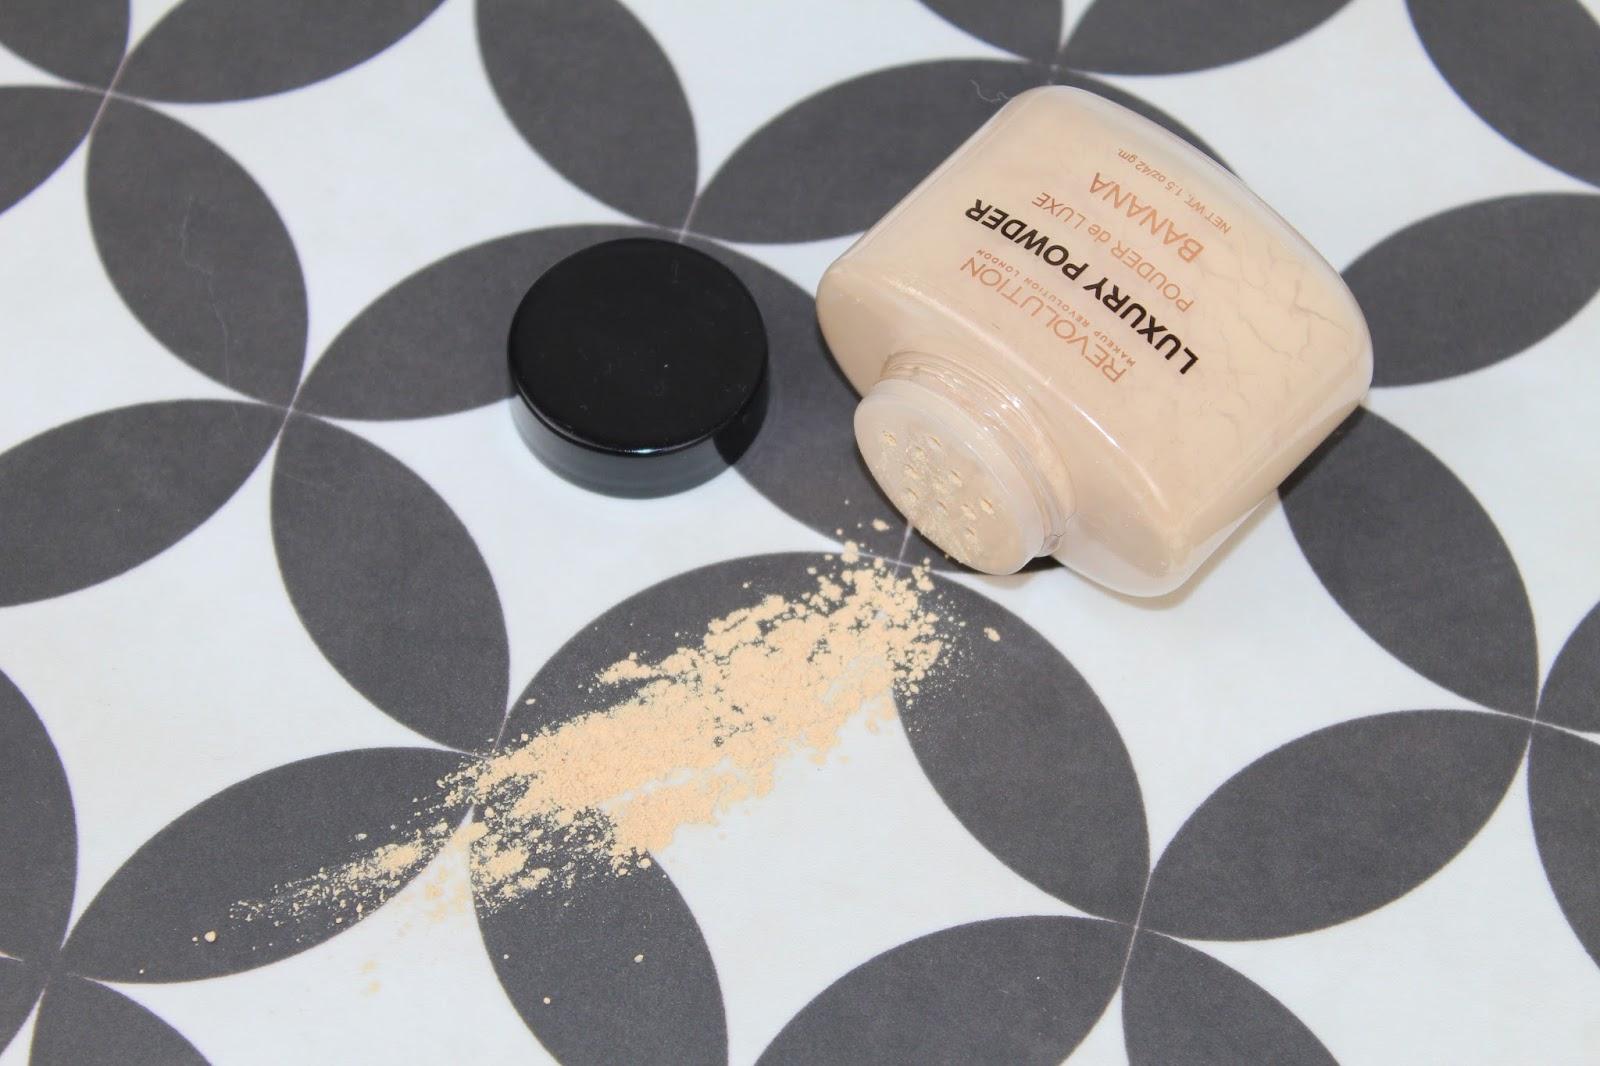 Makeup Revolution Banana Powder Review and Photos